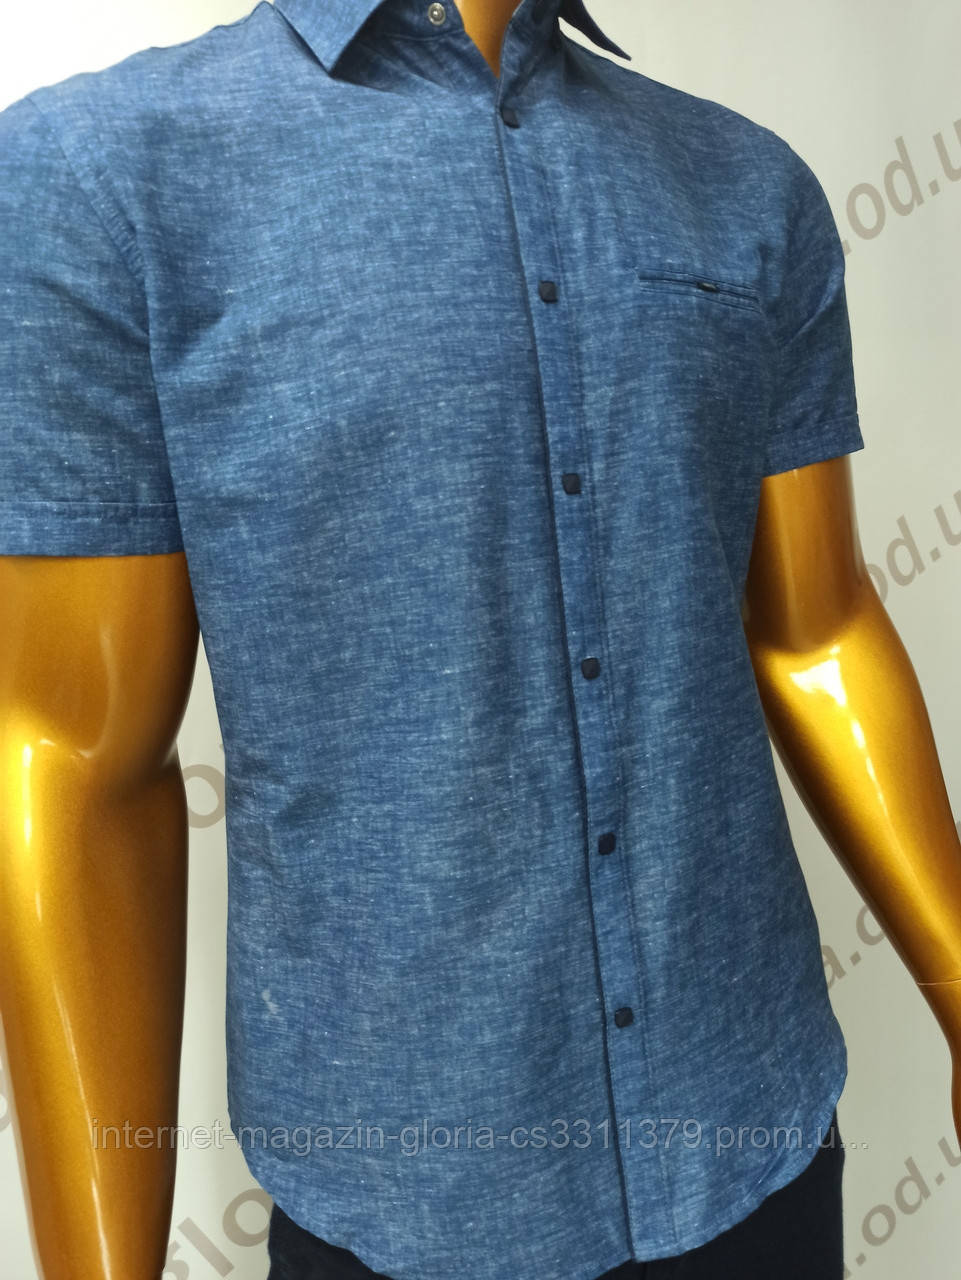 Мужская рубашка Amato. AG.19846(s). Размеры:L,XL(2), XXL.